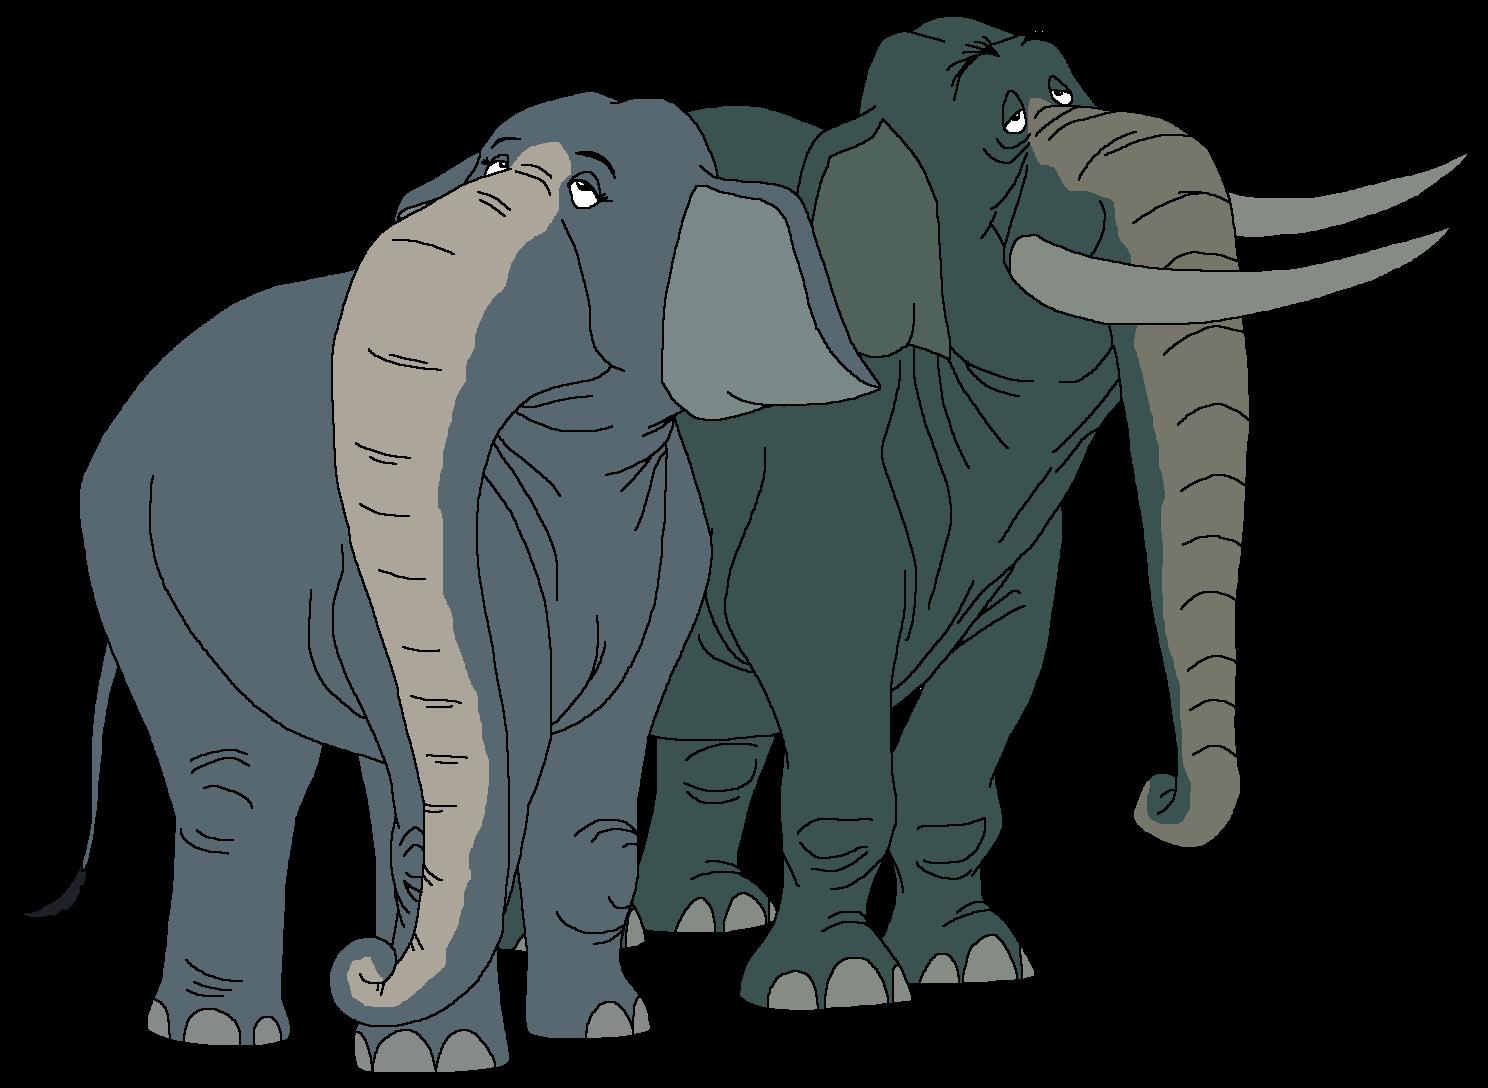 Grandma and Grandpa Elephant